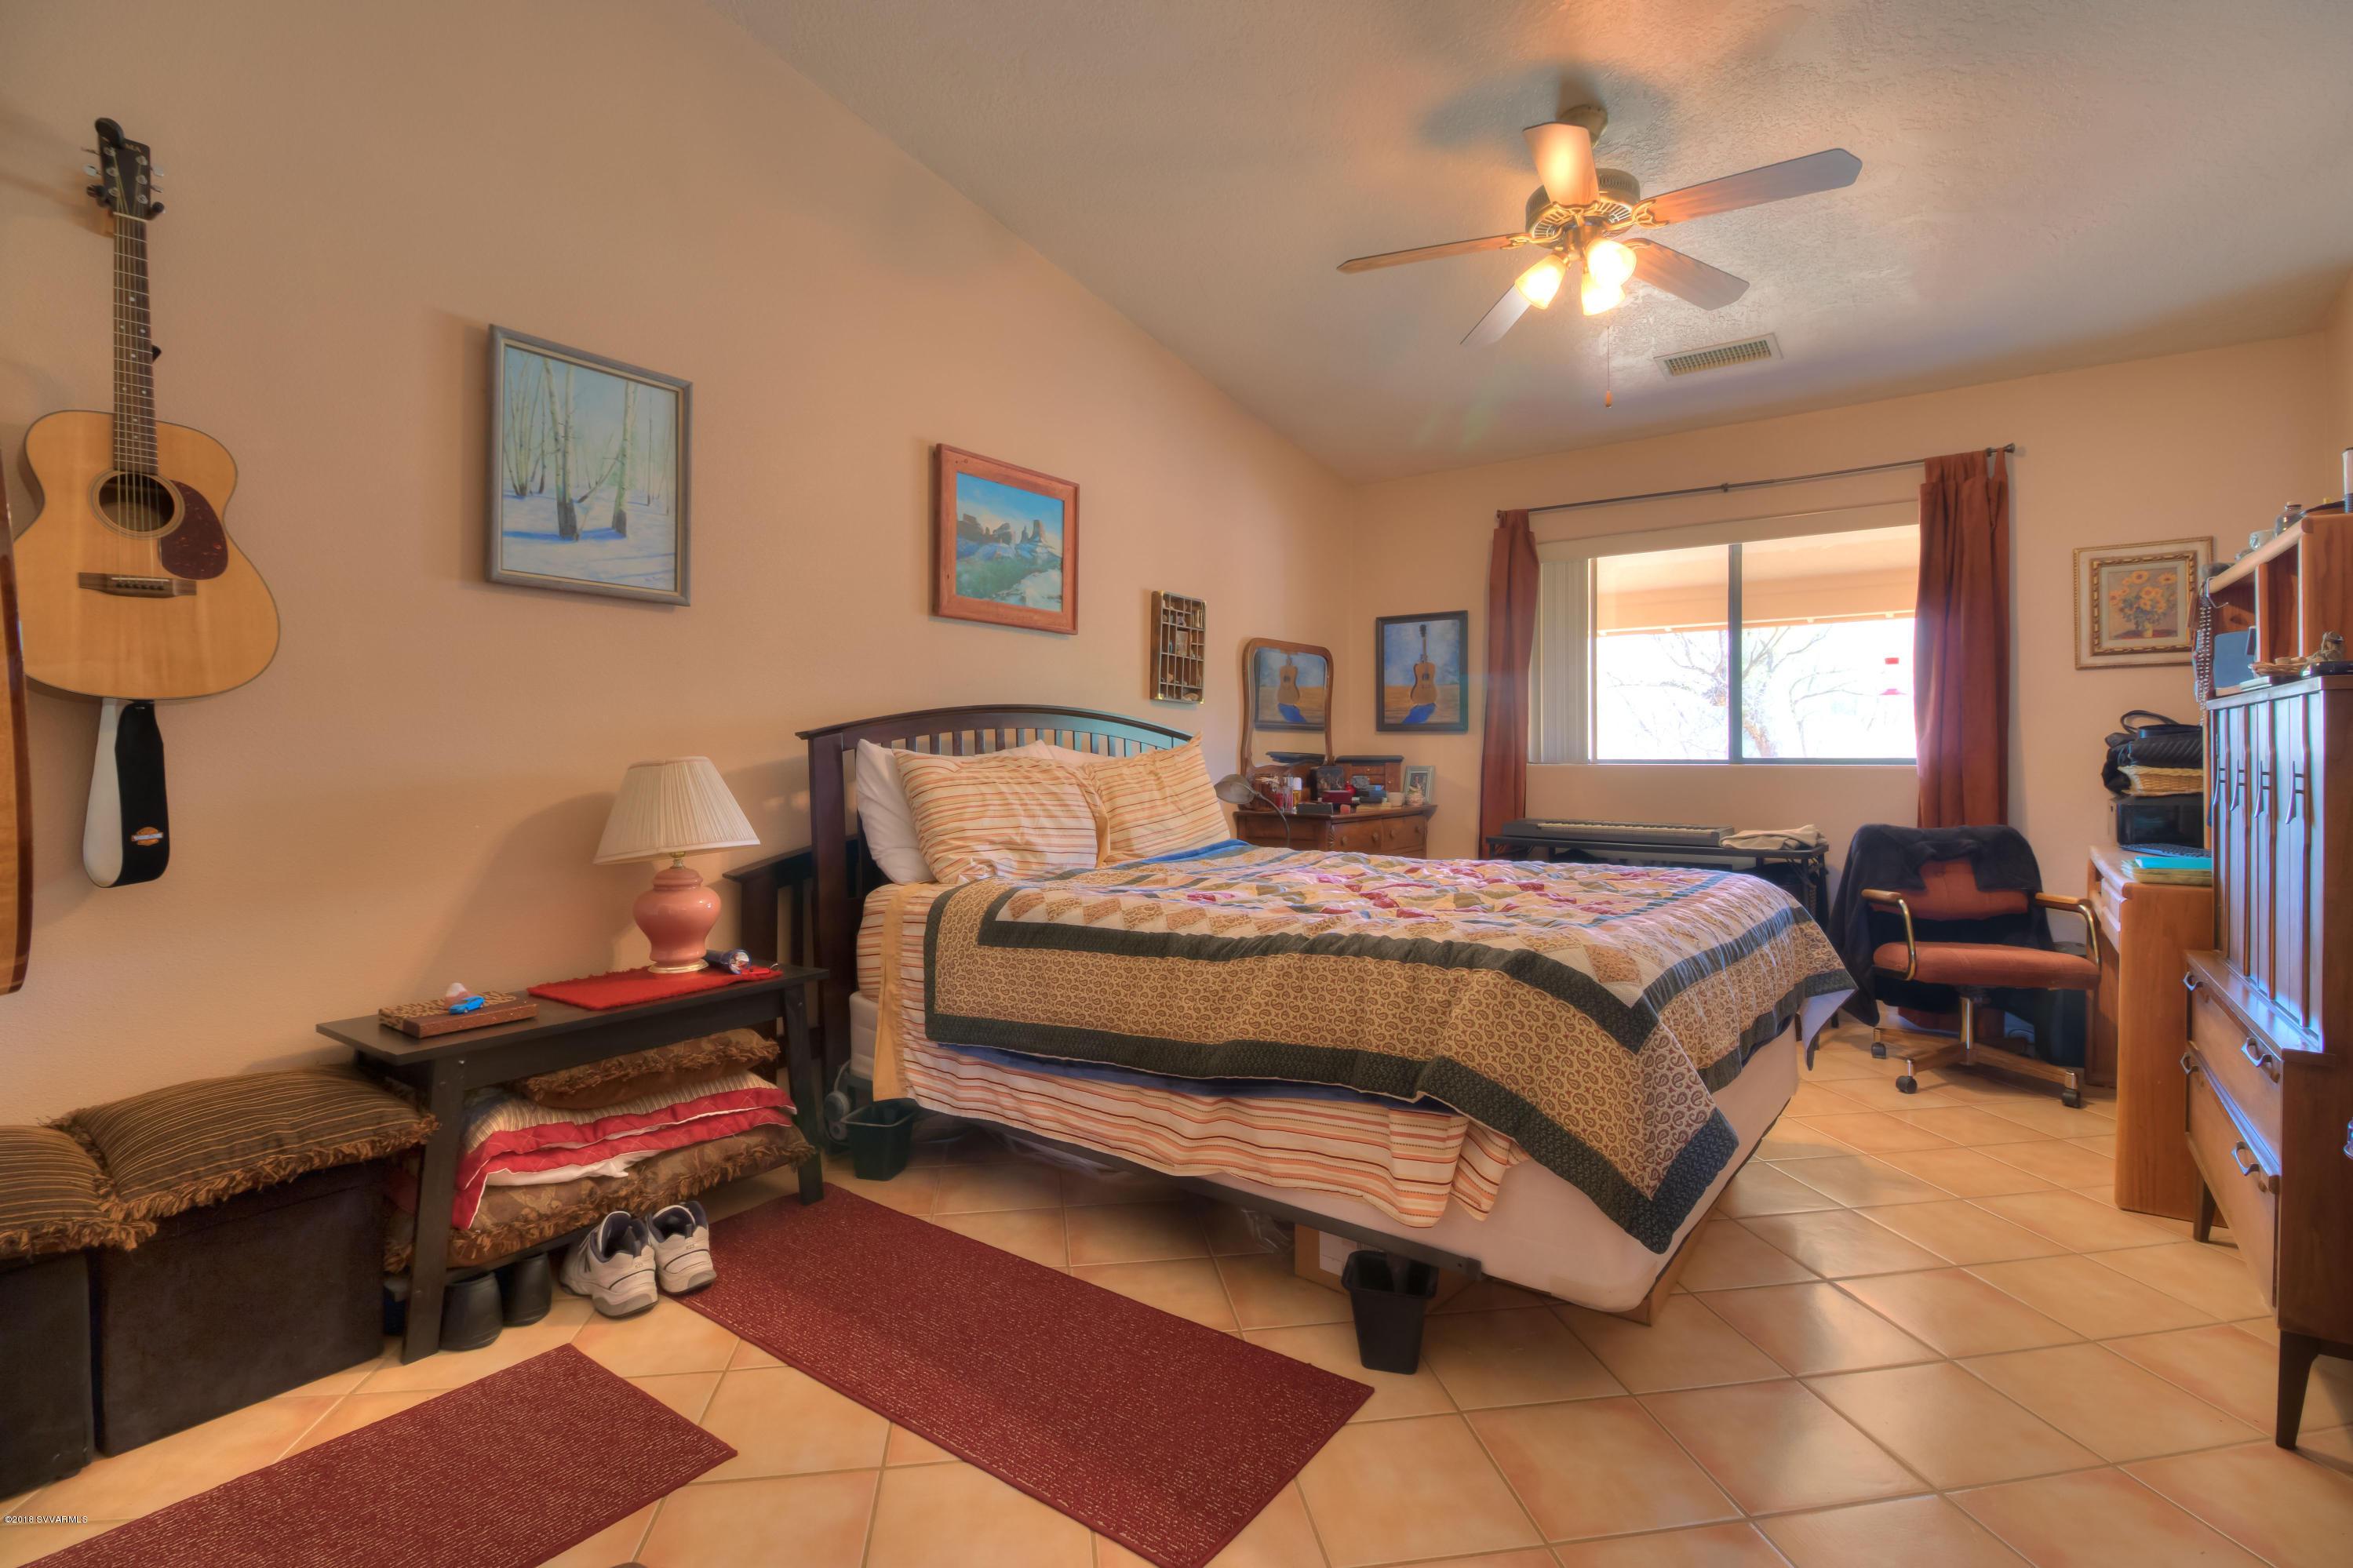 9770 E Cornville Rd Cornville, AZ 86325